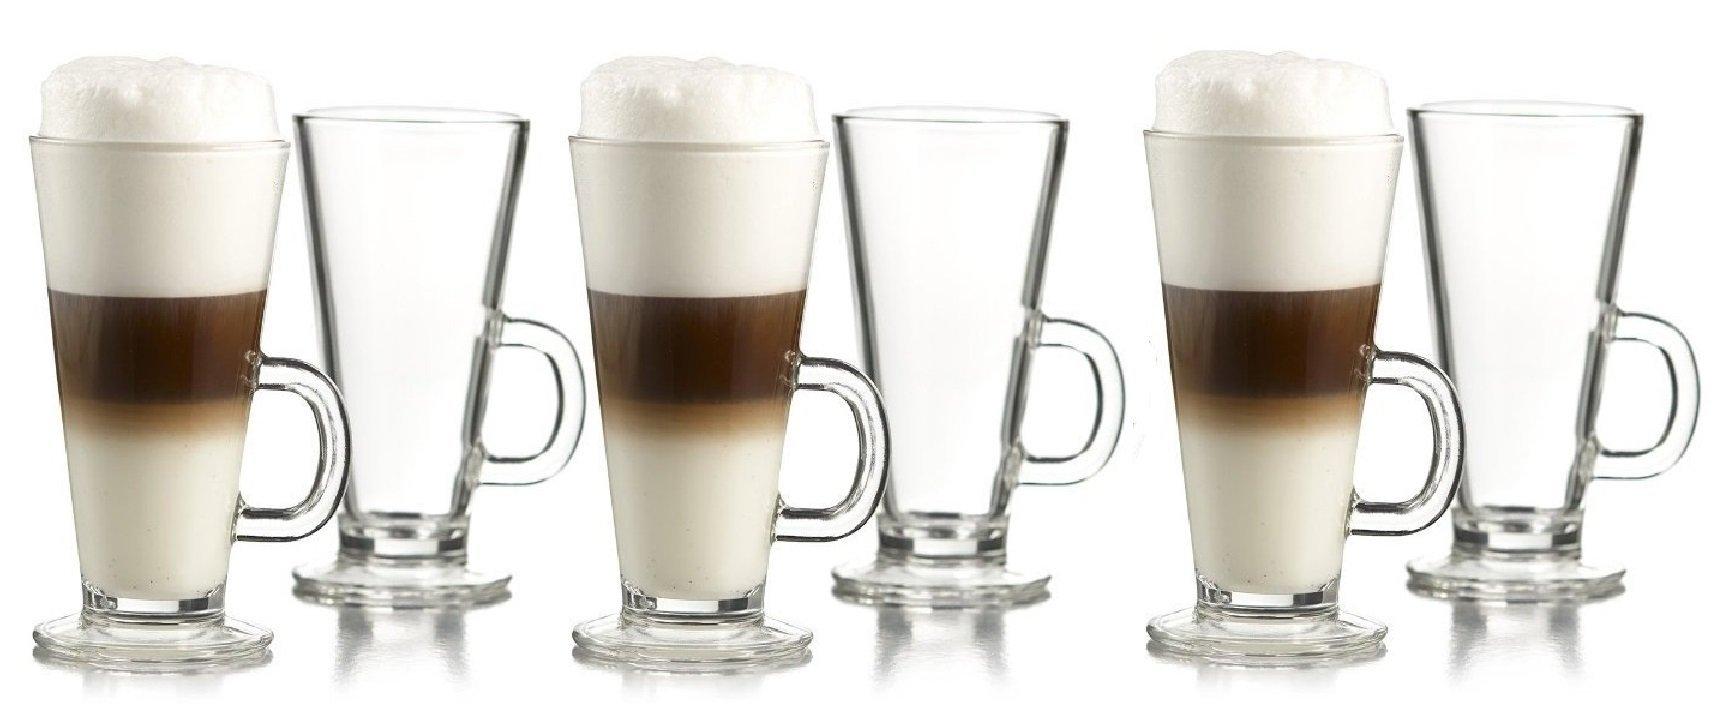 Irish Coffee Mug Tall Boy Set of 6